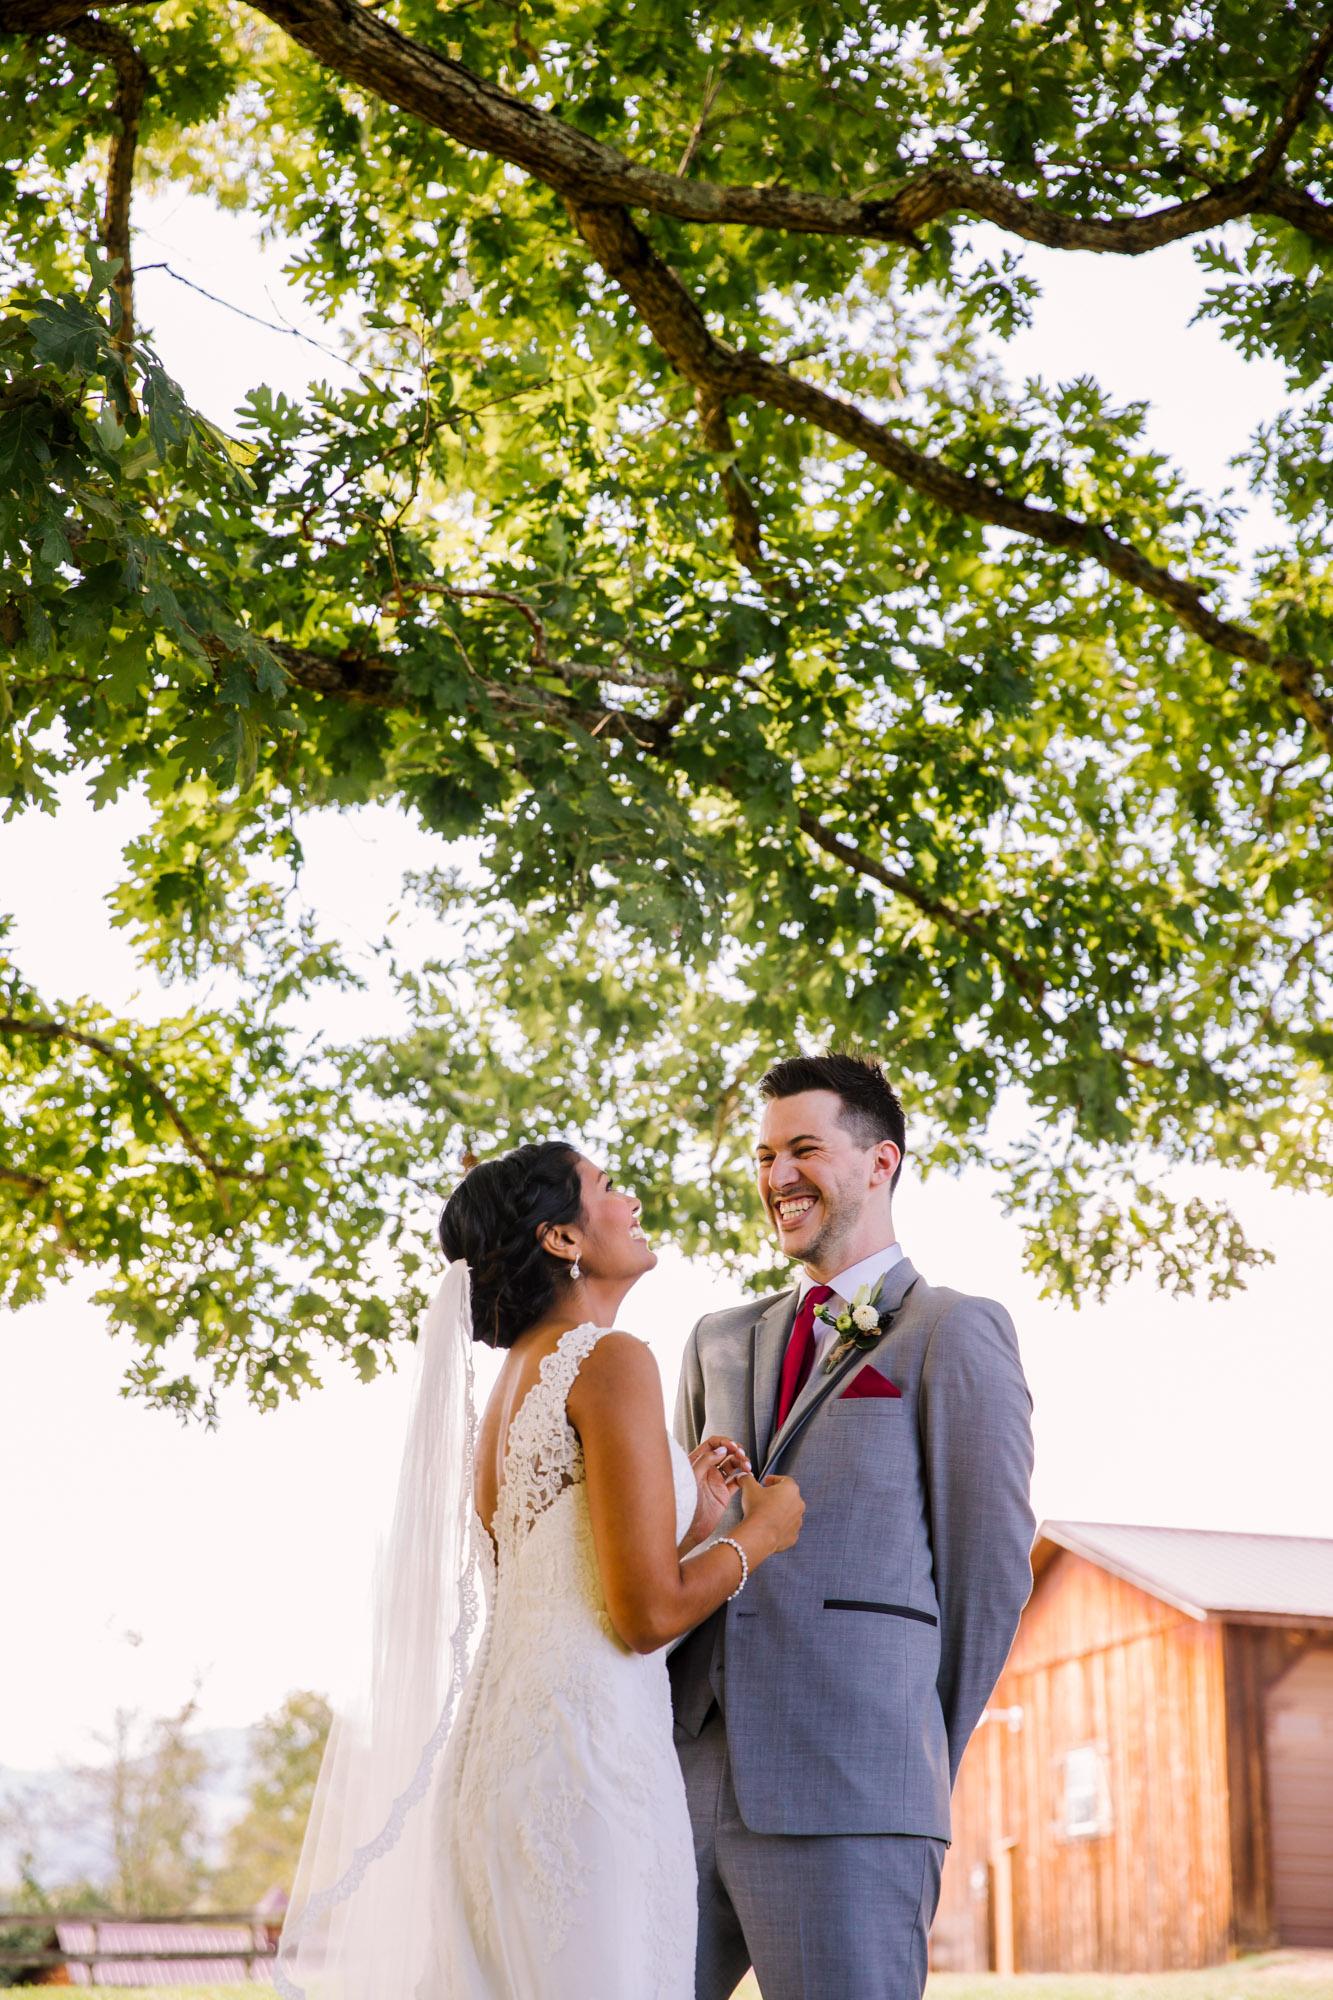 Waynesville NC Wedding Photography | Bride and Groom Laughing